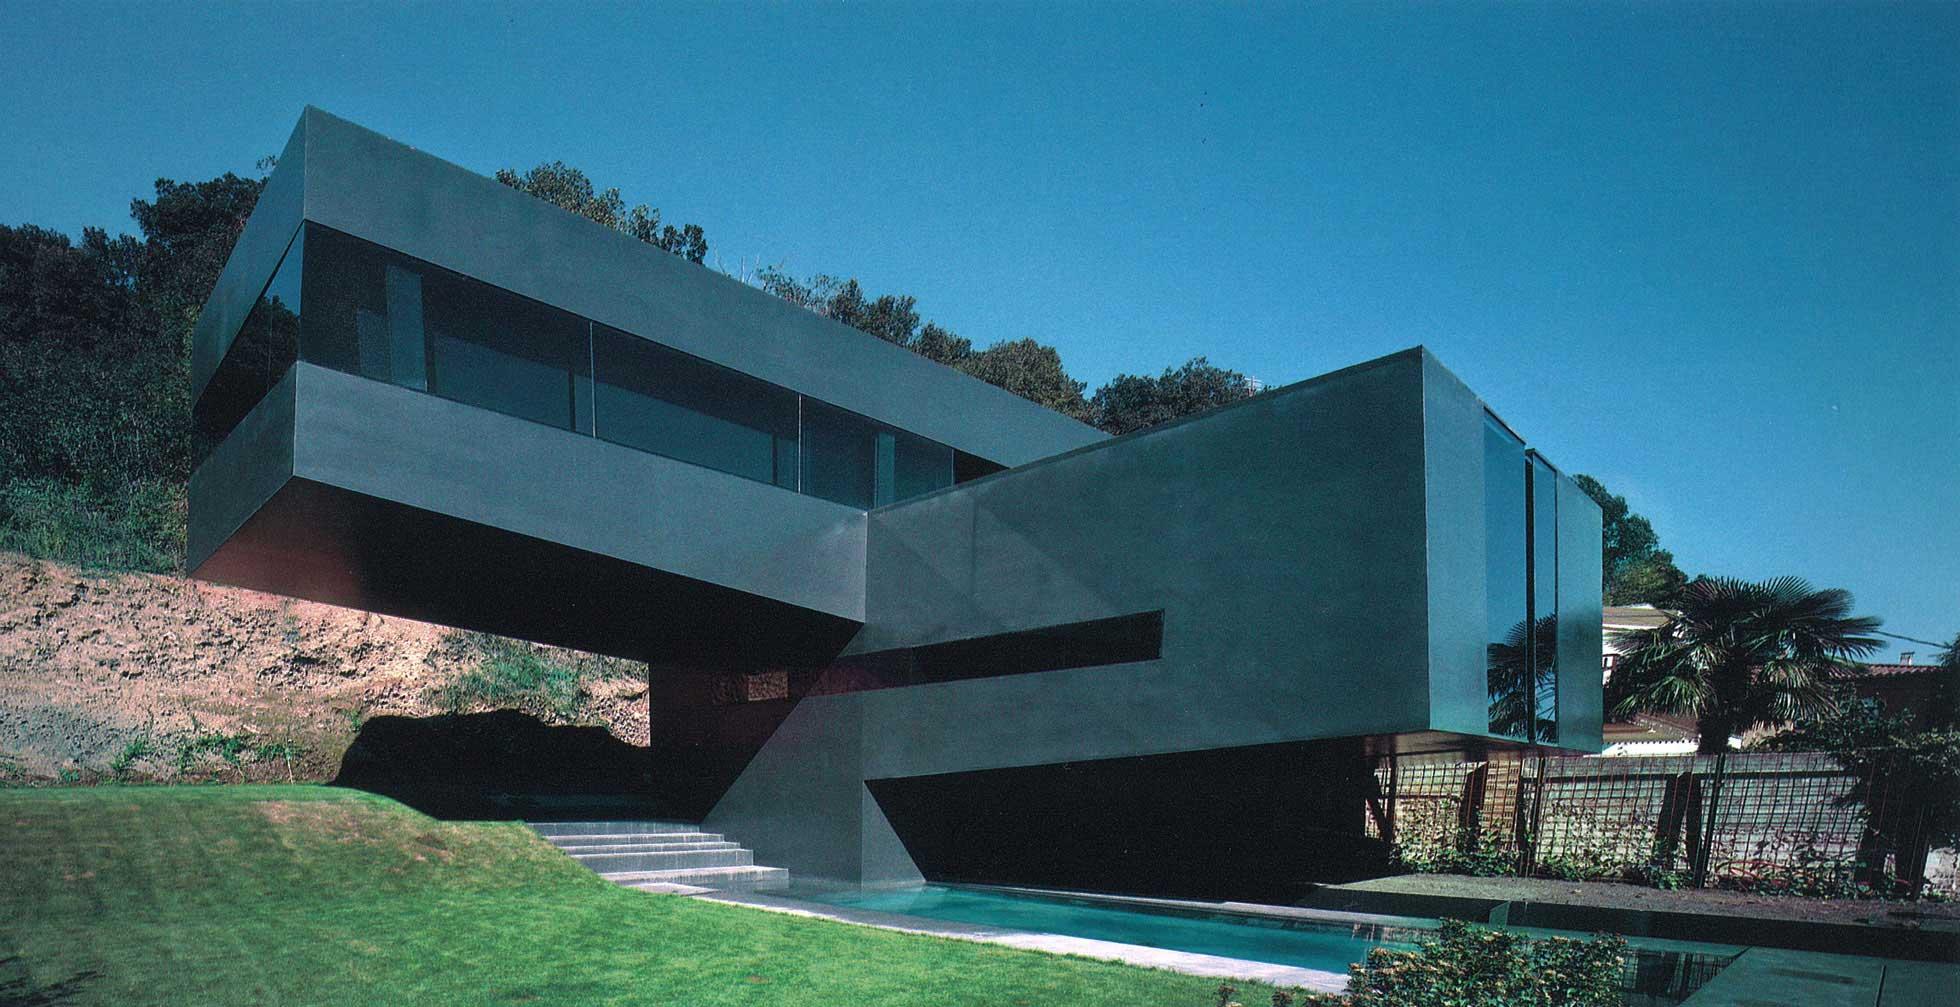 Estructures residencial blazquez guanter - Carpintero en barcelona ...